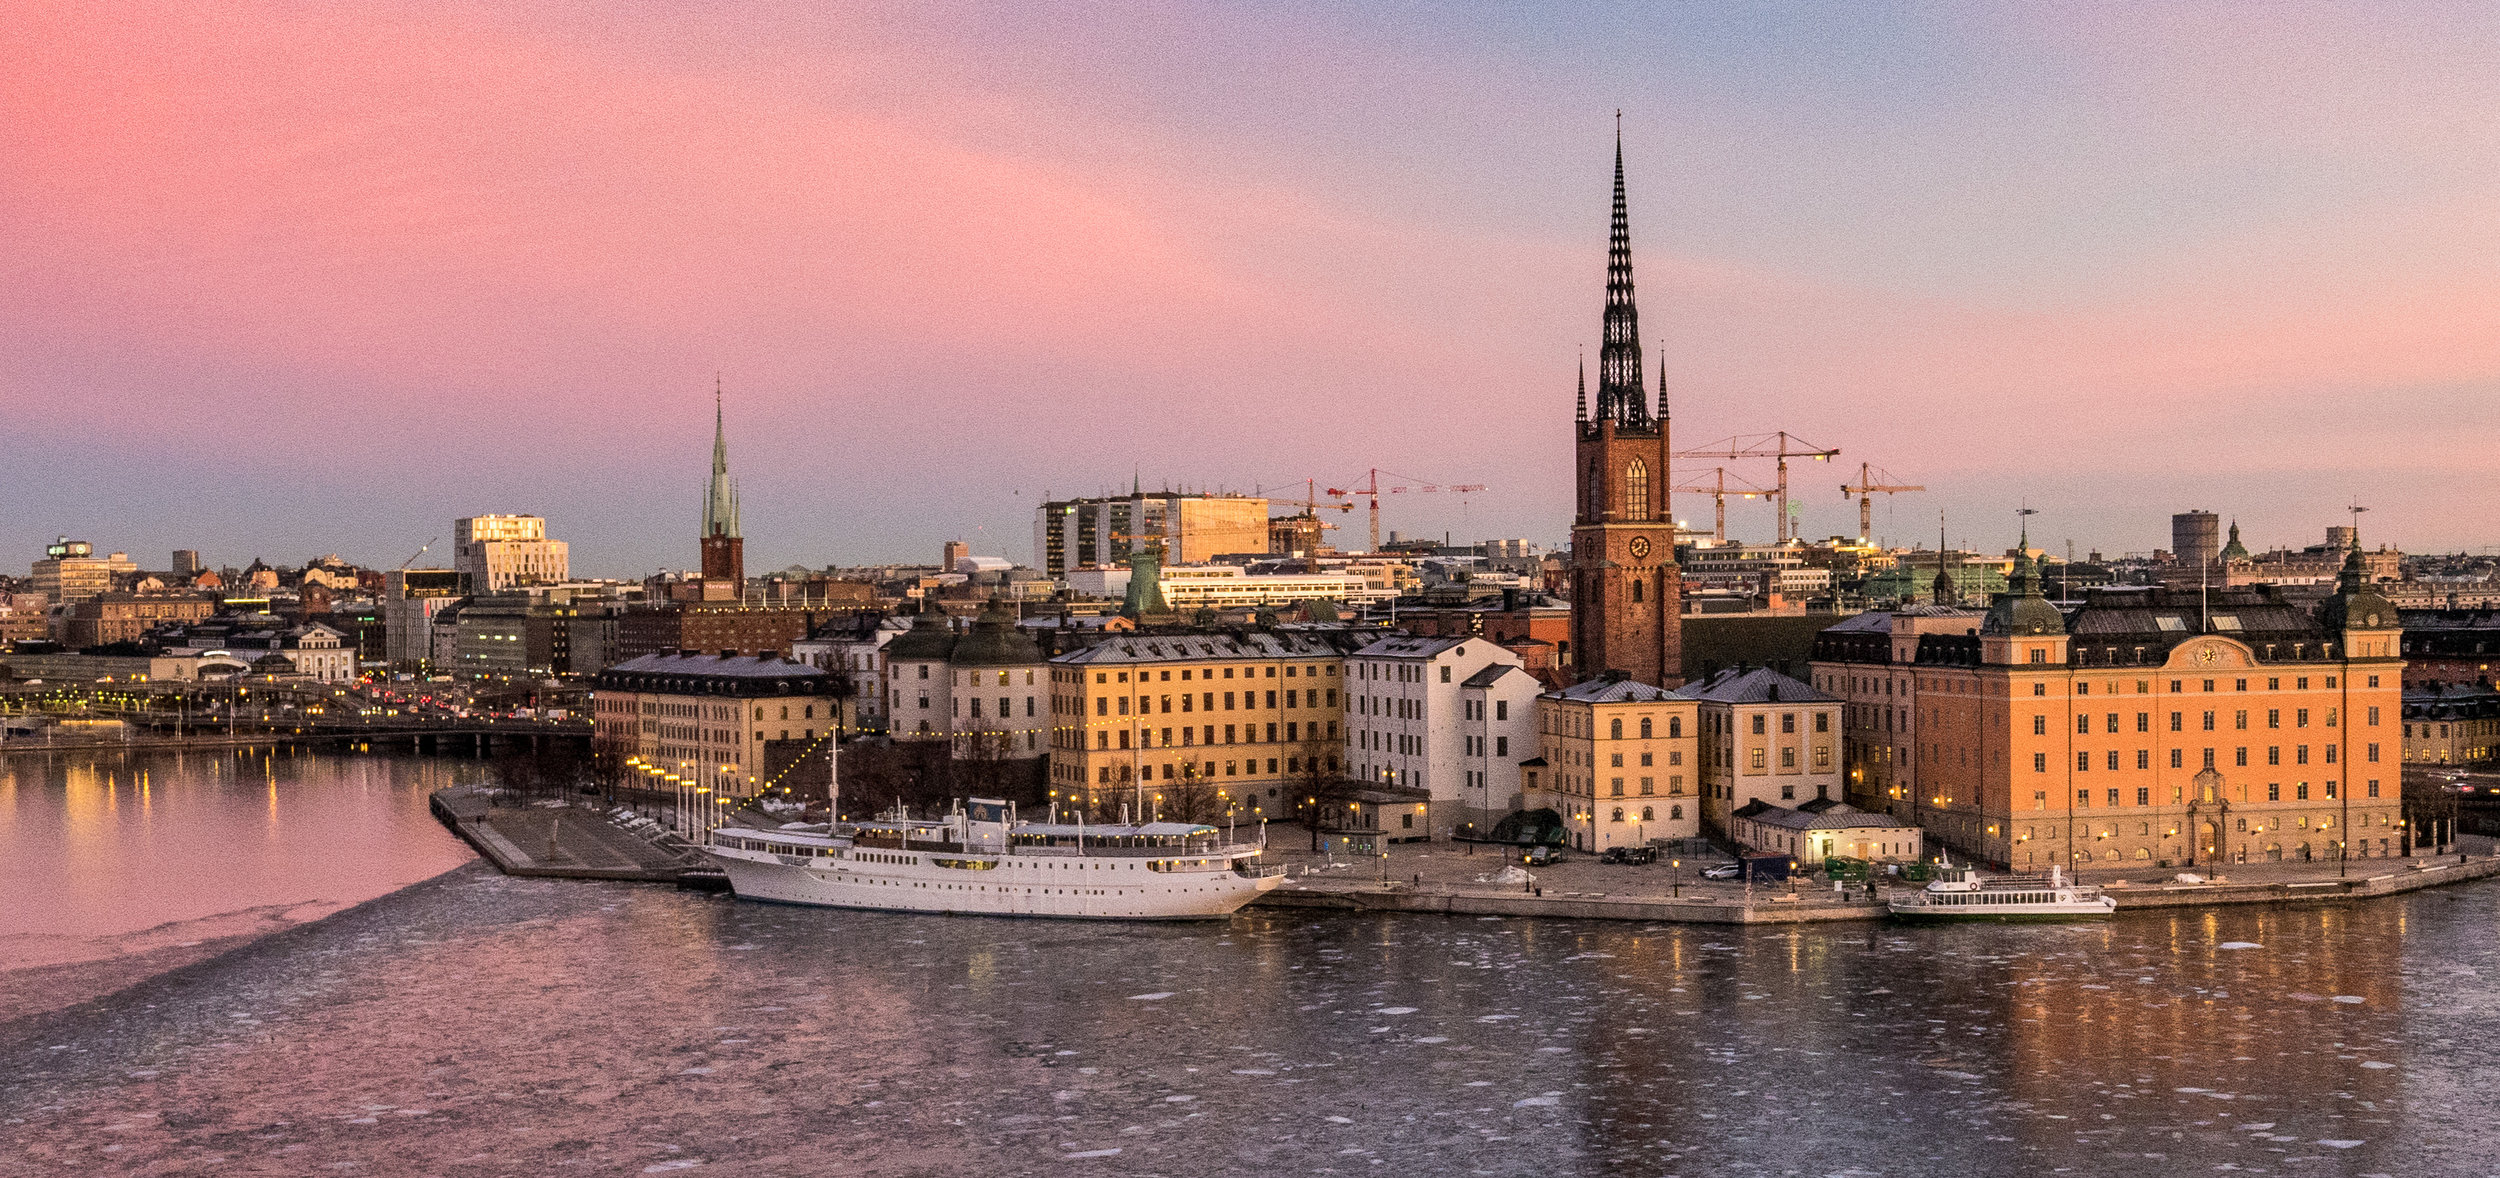 Riddarholmen, Stockholm, 24 januari 2017. Foto: Nils Öhman